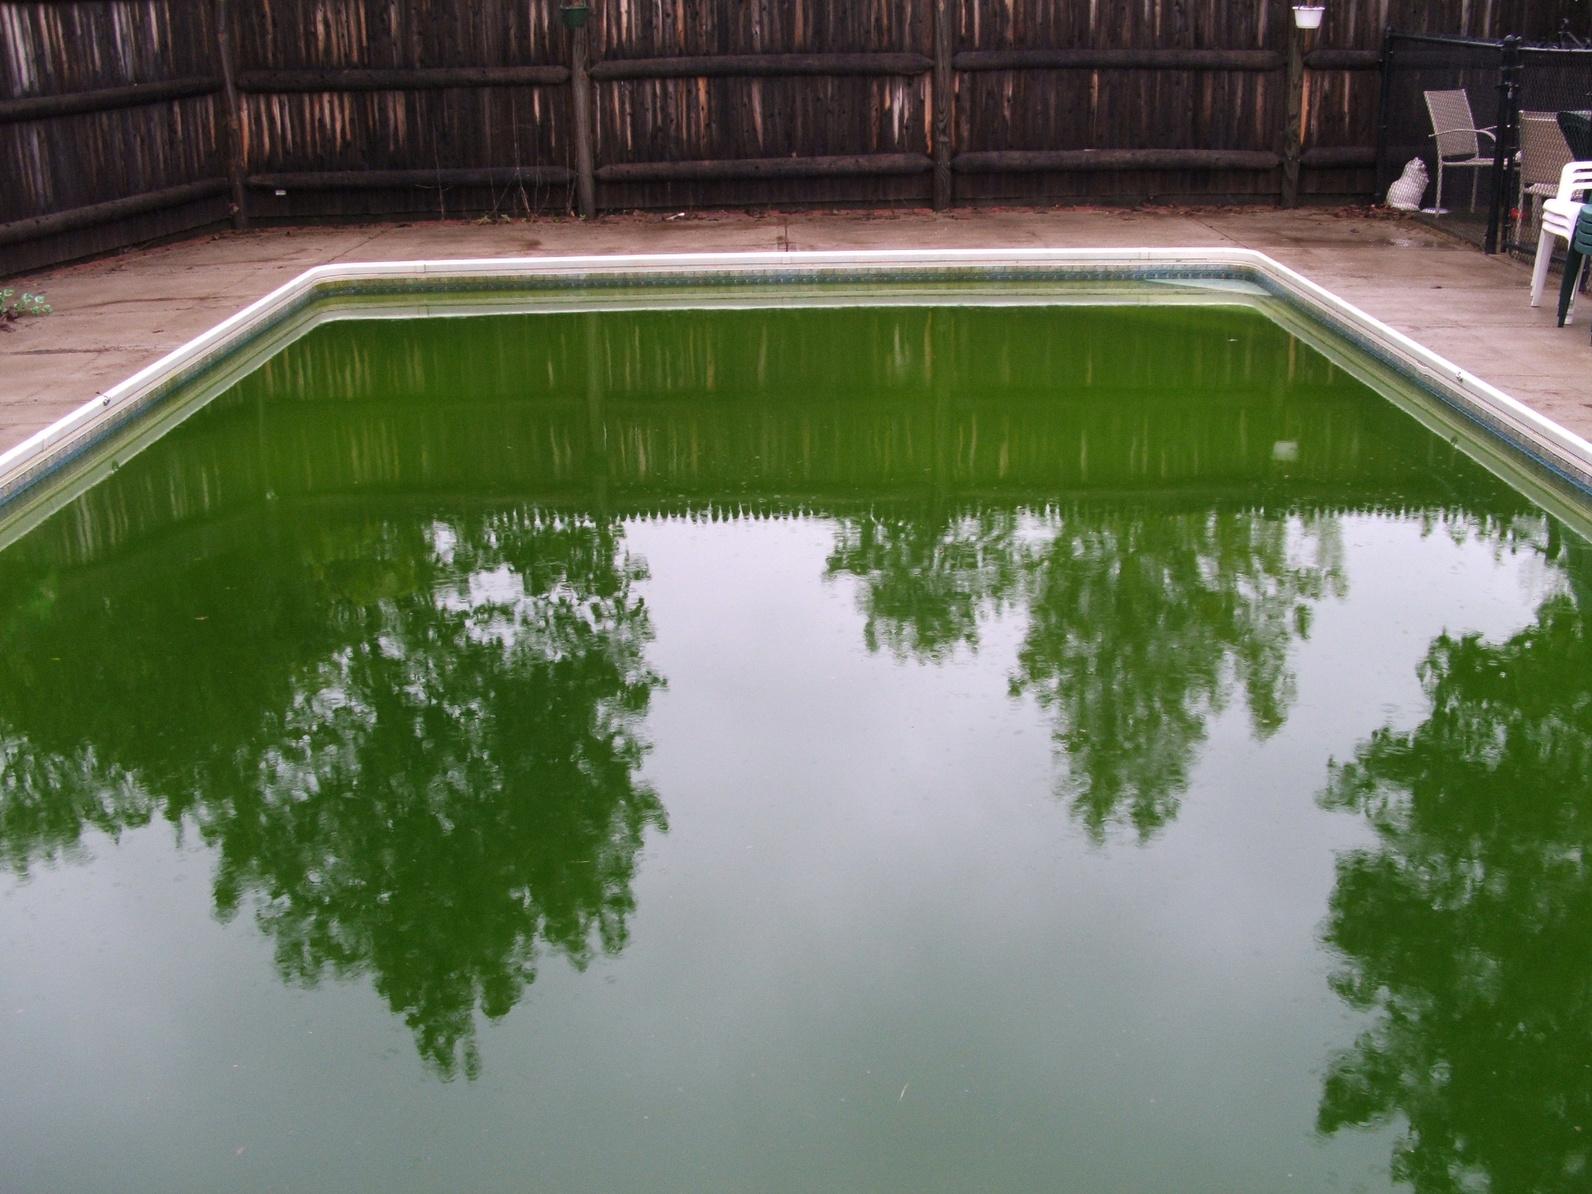 C mo limpiar una piscina con agua verde piscinas iguaz - Agua de la piscina turbia ...